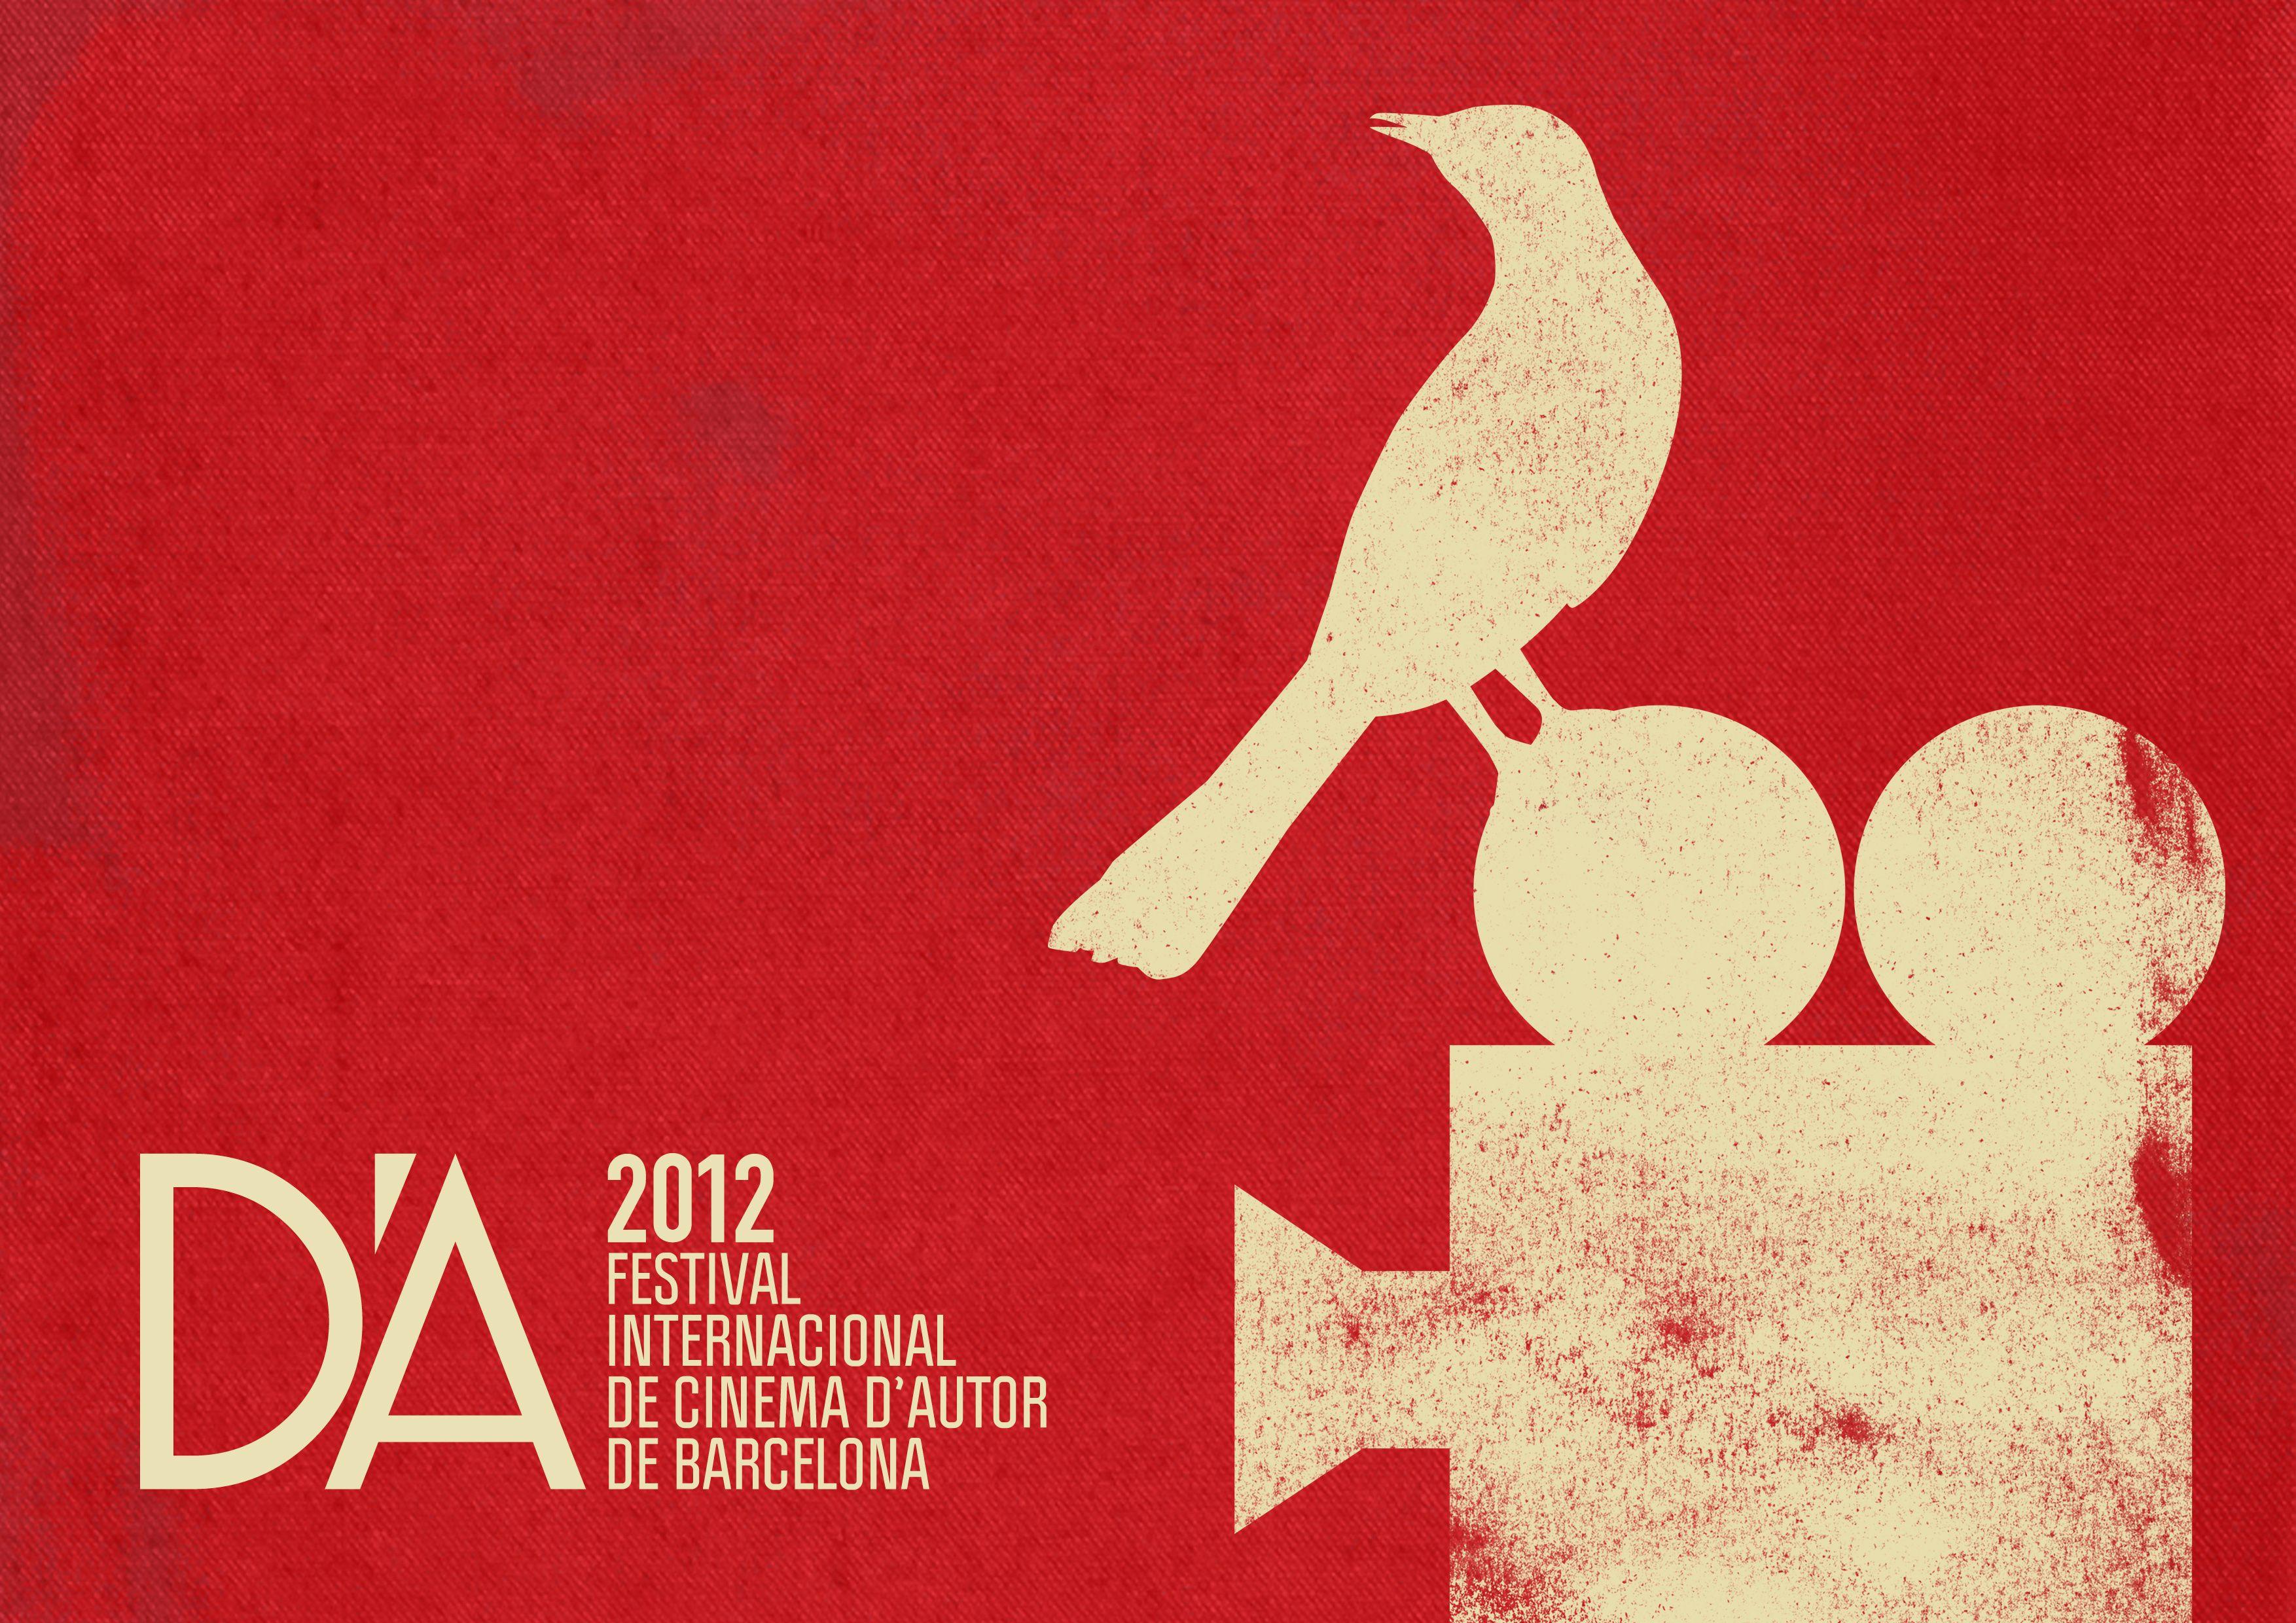 poster_DA_2012_horitzontal